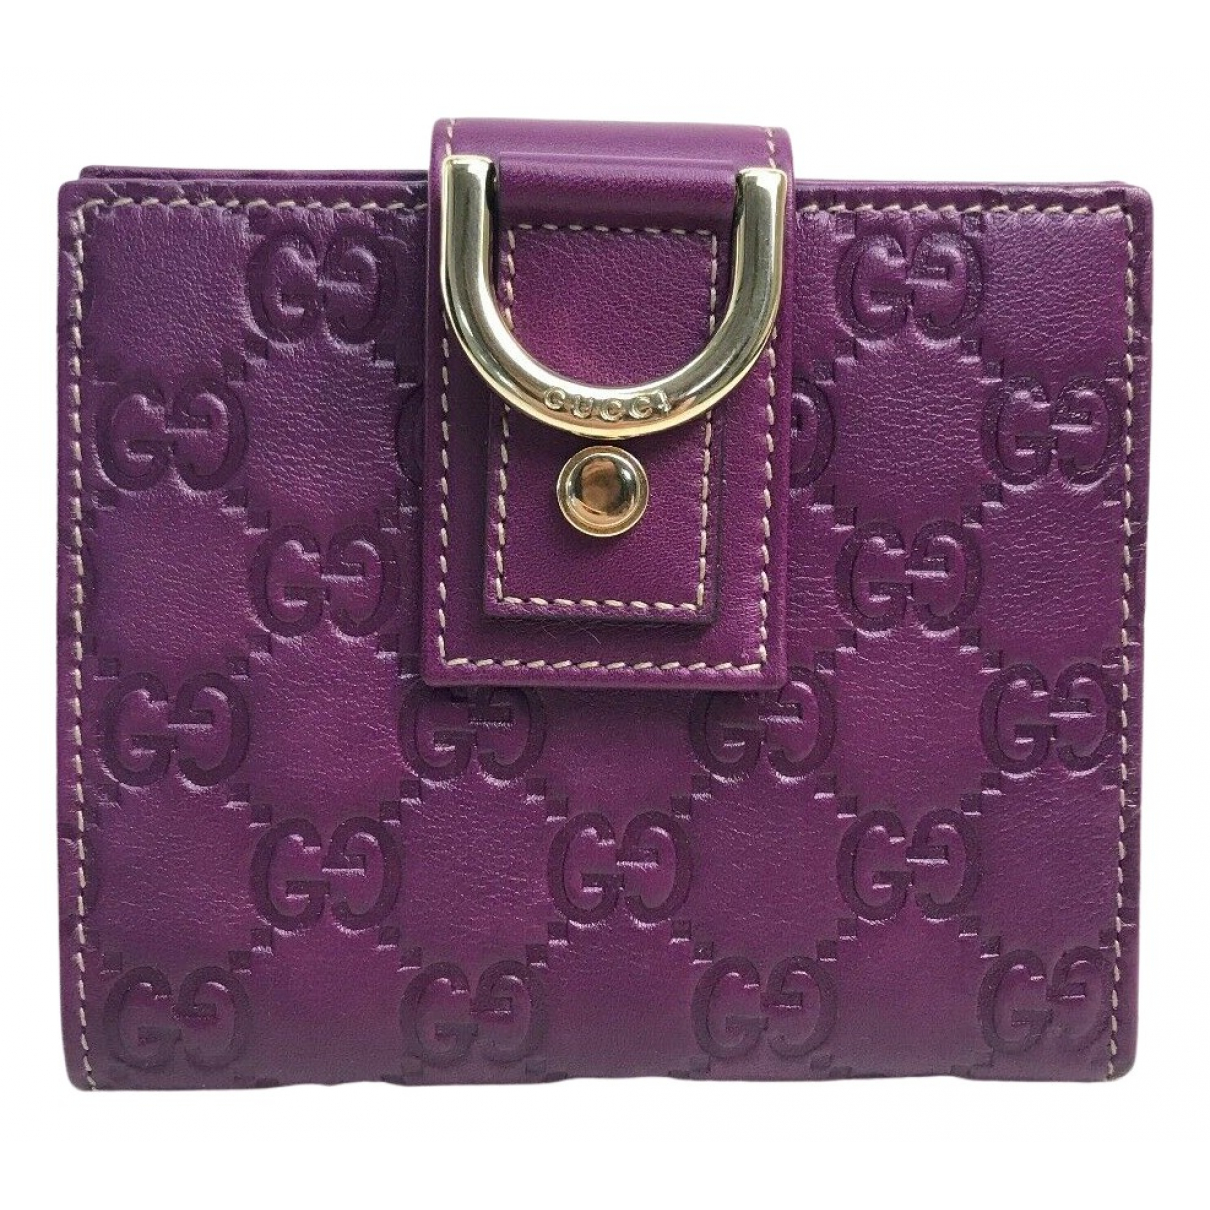 Gucci N Purple Leather wallet for Women N